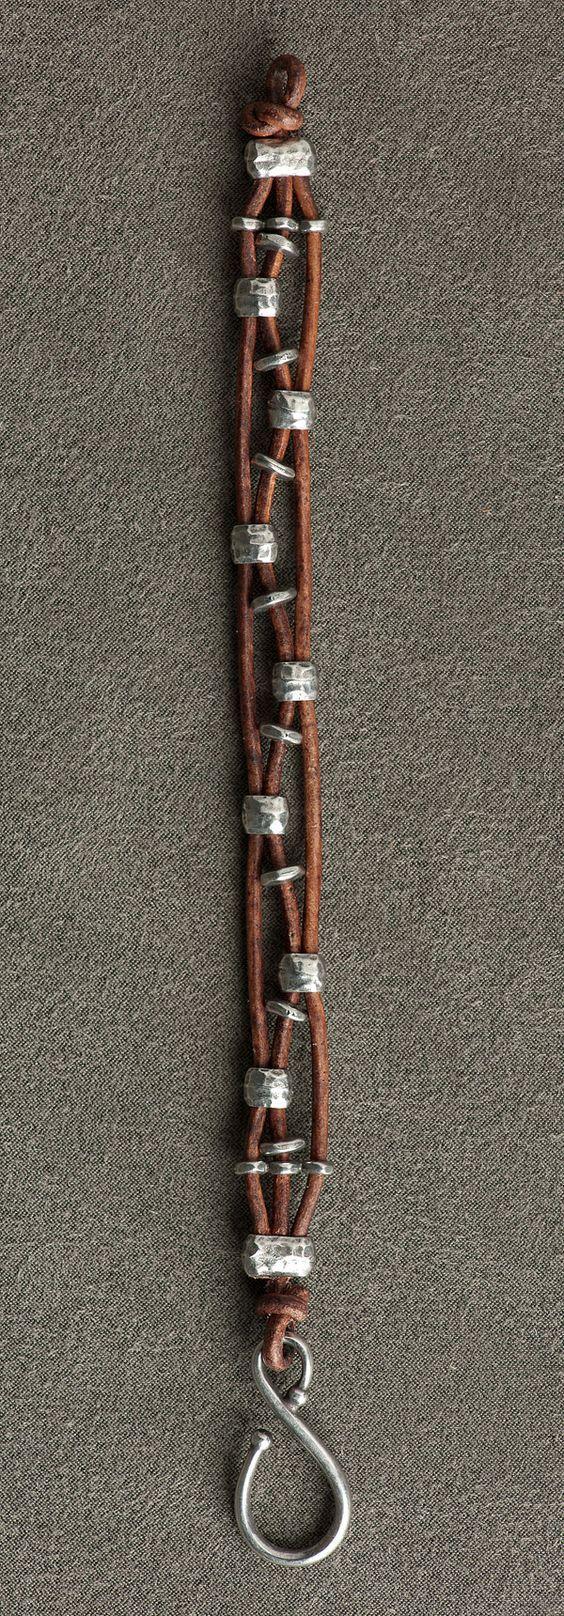 Coolest DIY Bracelet Ideas For Anyone - DIY Zero